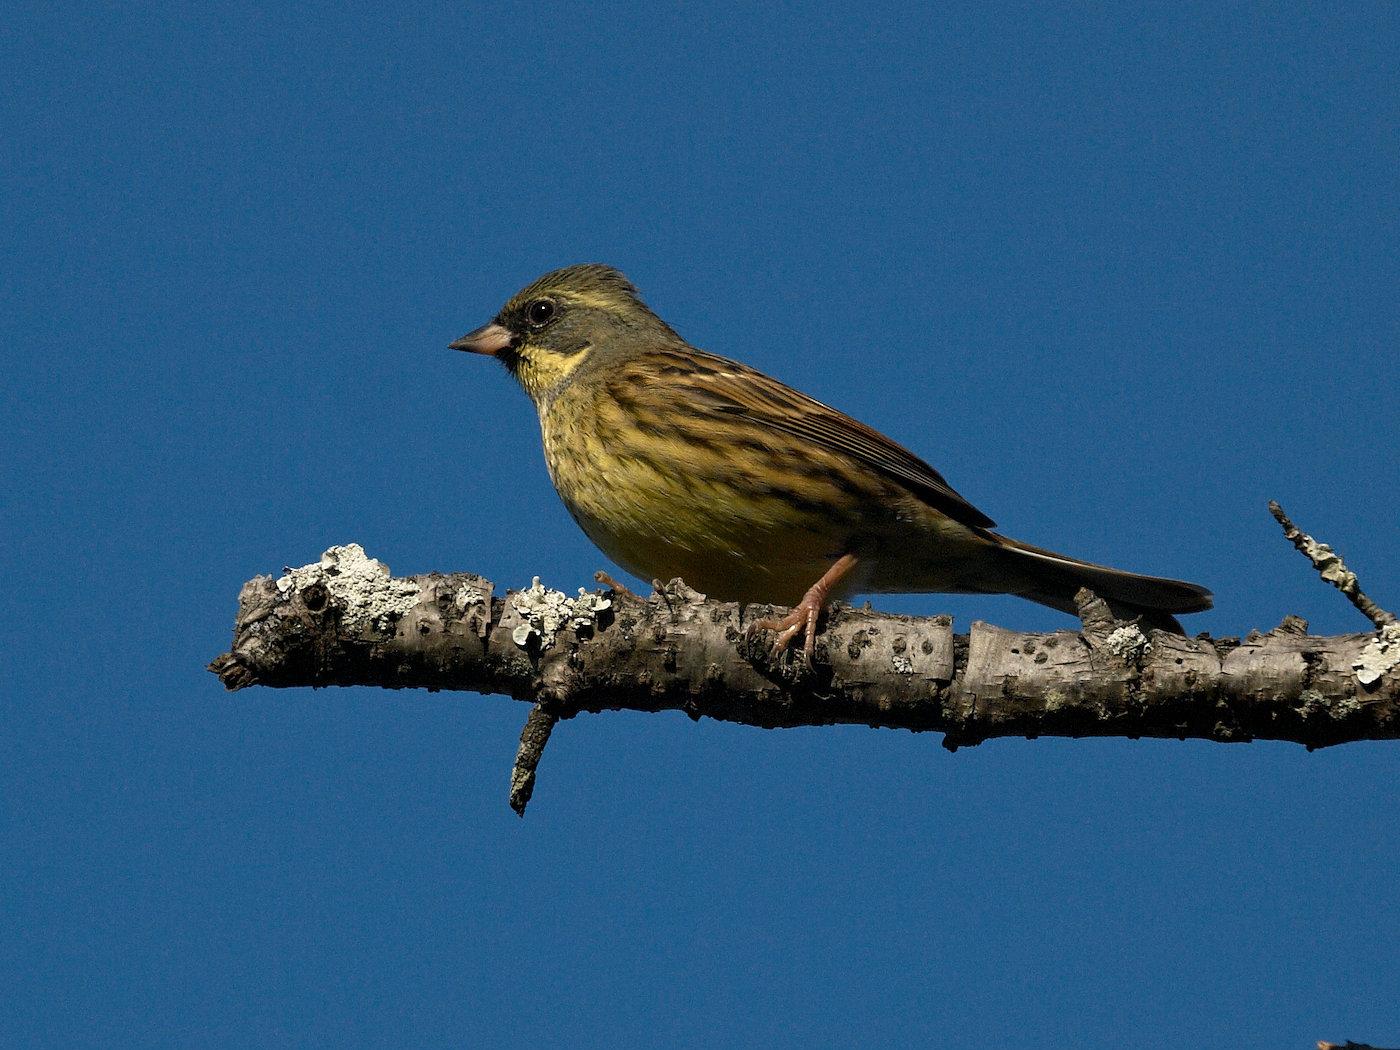 BORG50FLで撮影した野鳥・アオジの写真画像